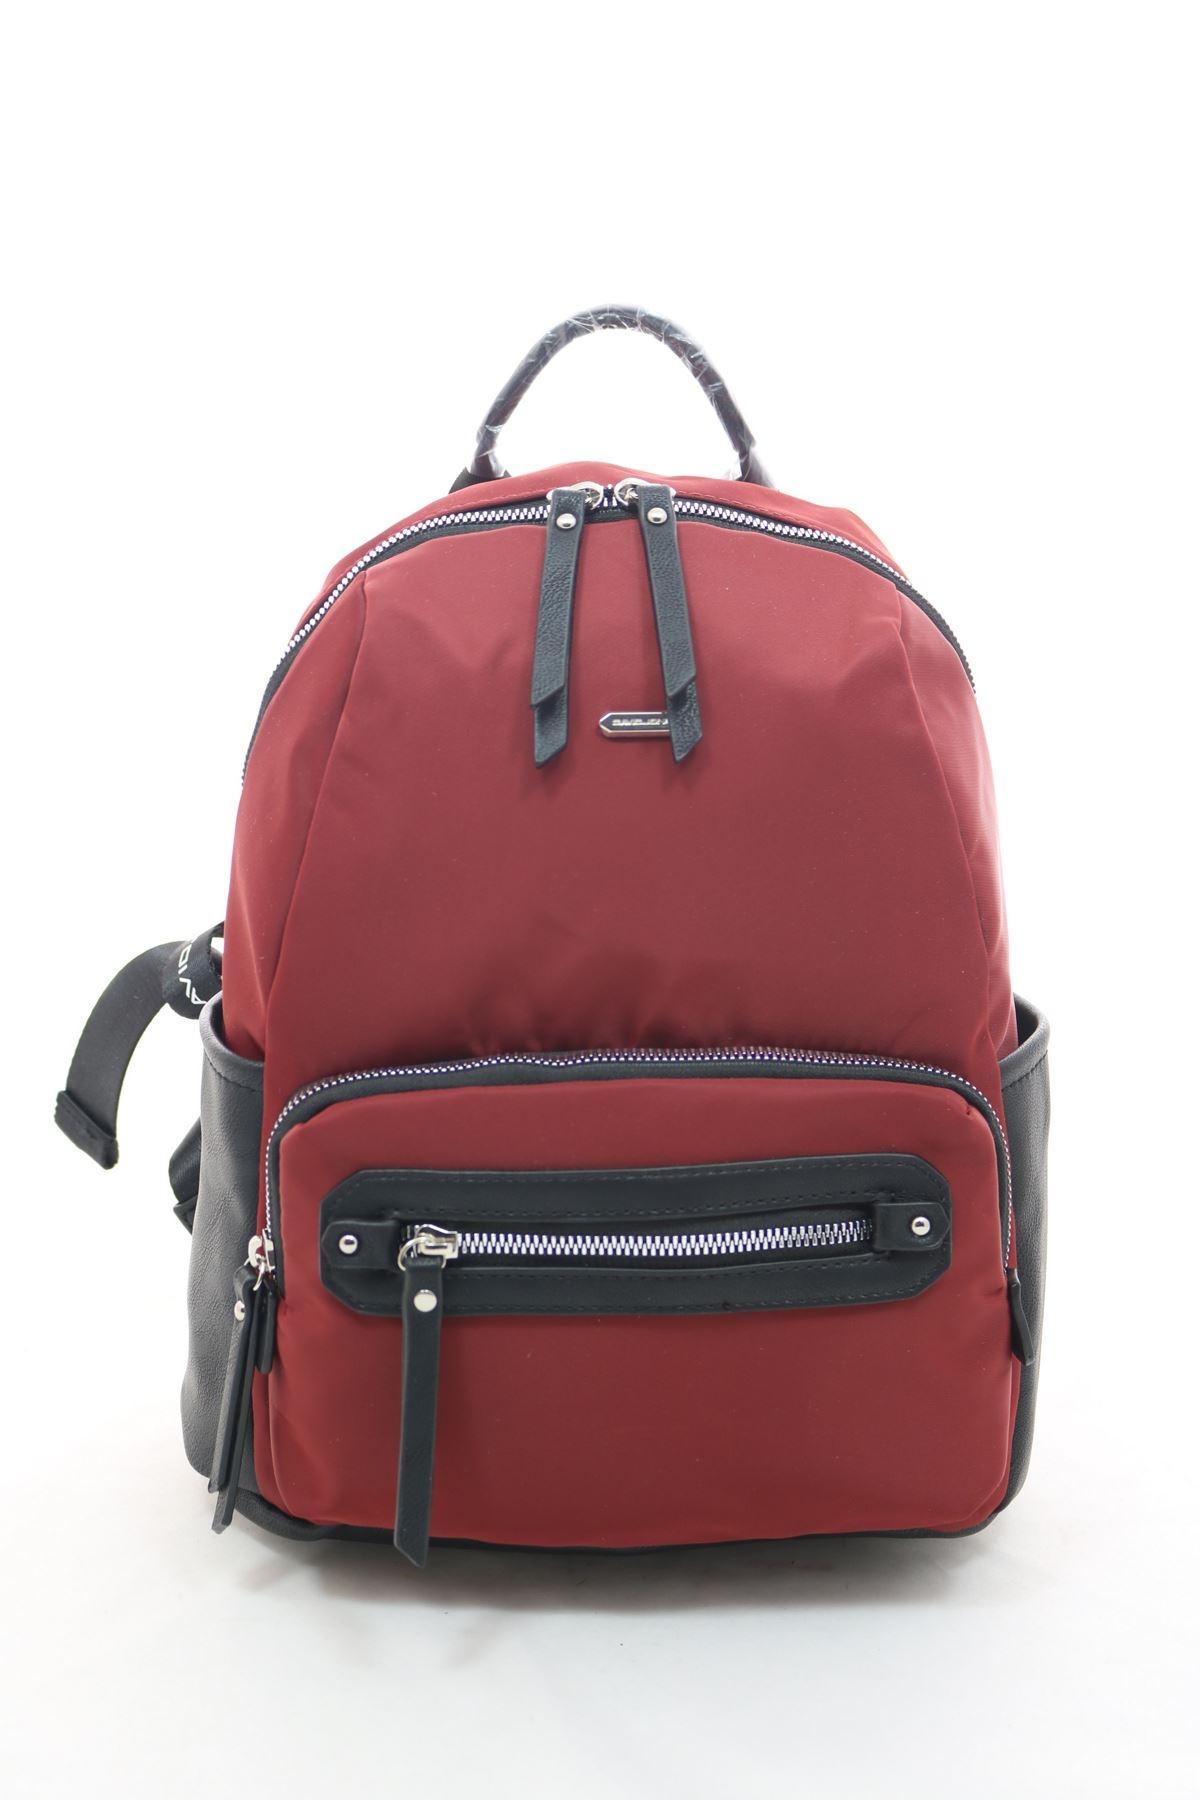 Рюкзак David Jones 5976-4 оптом